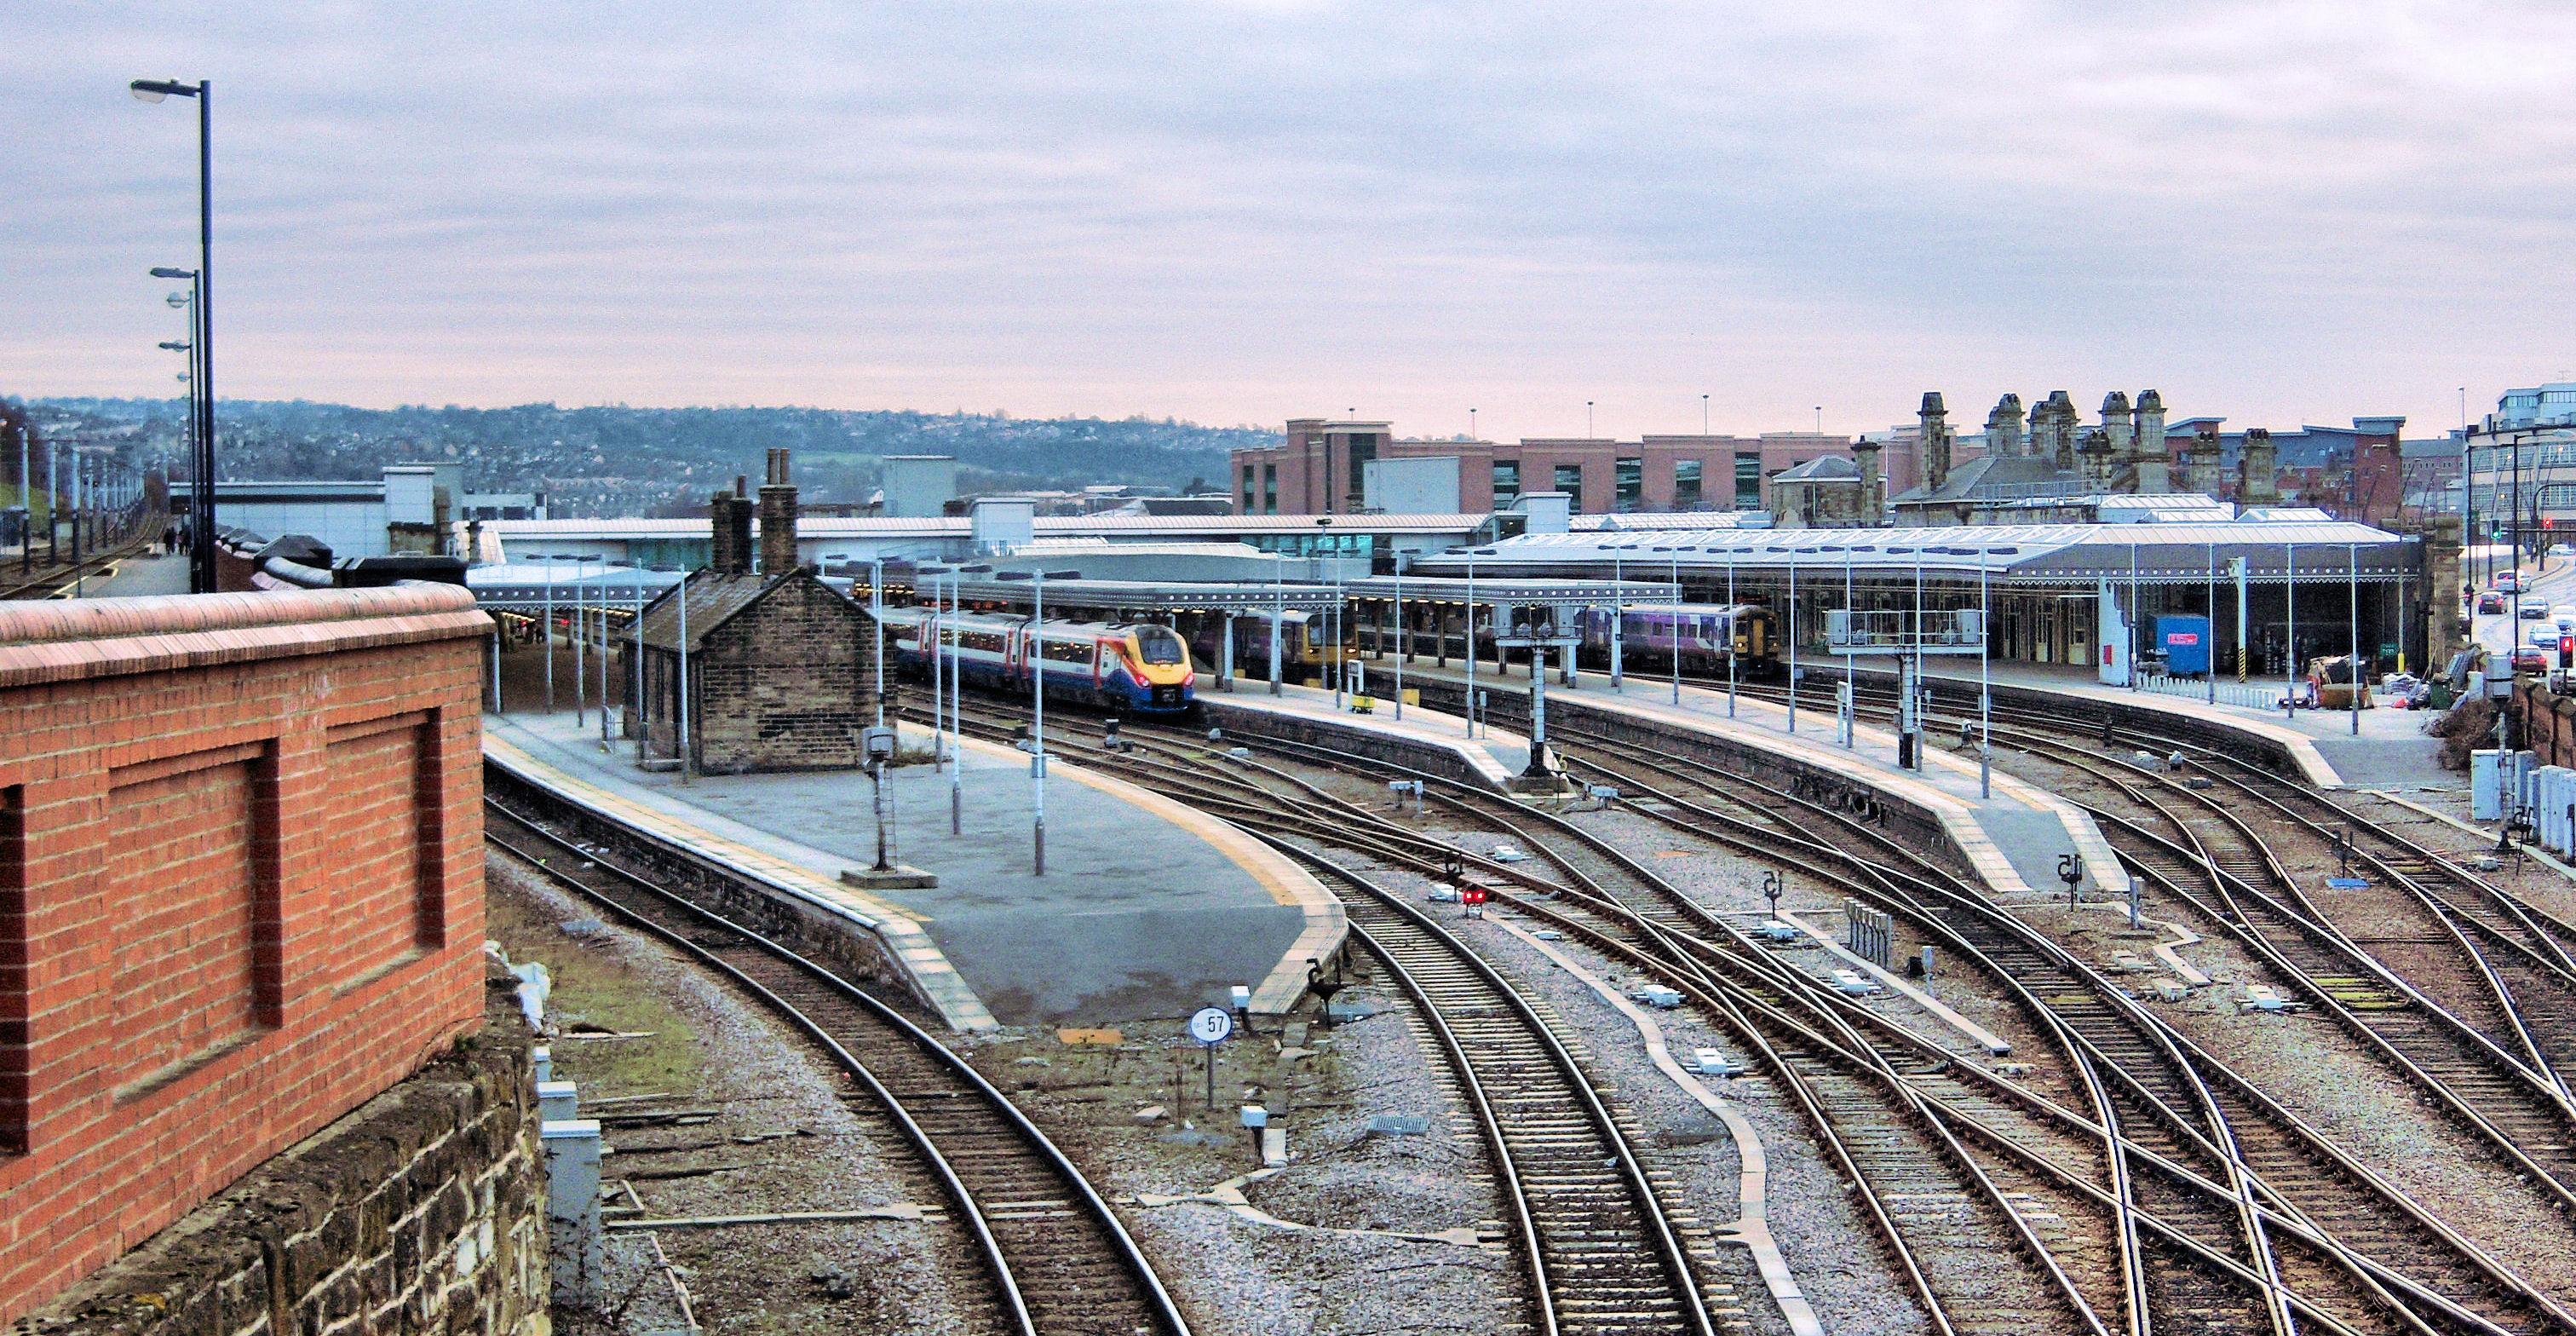 K Chesterfield File:Sheffield Station panorama.jpg - Wikimedia Commons